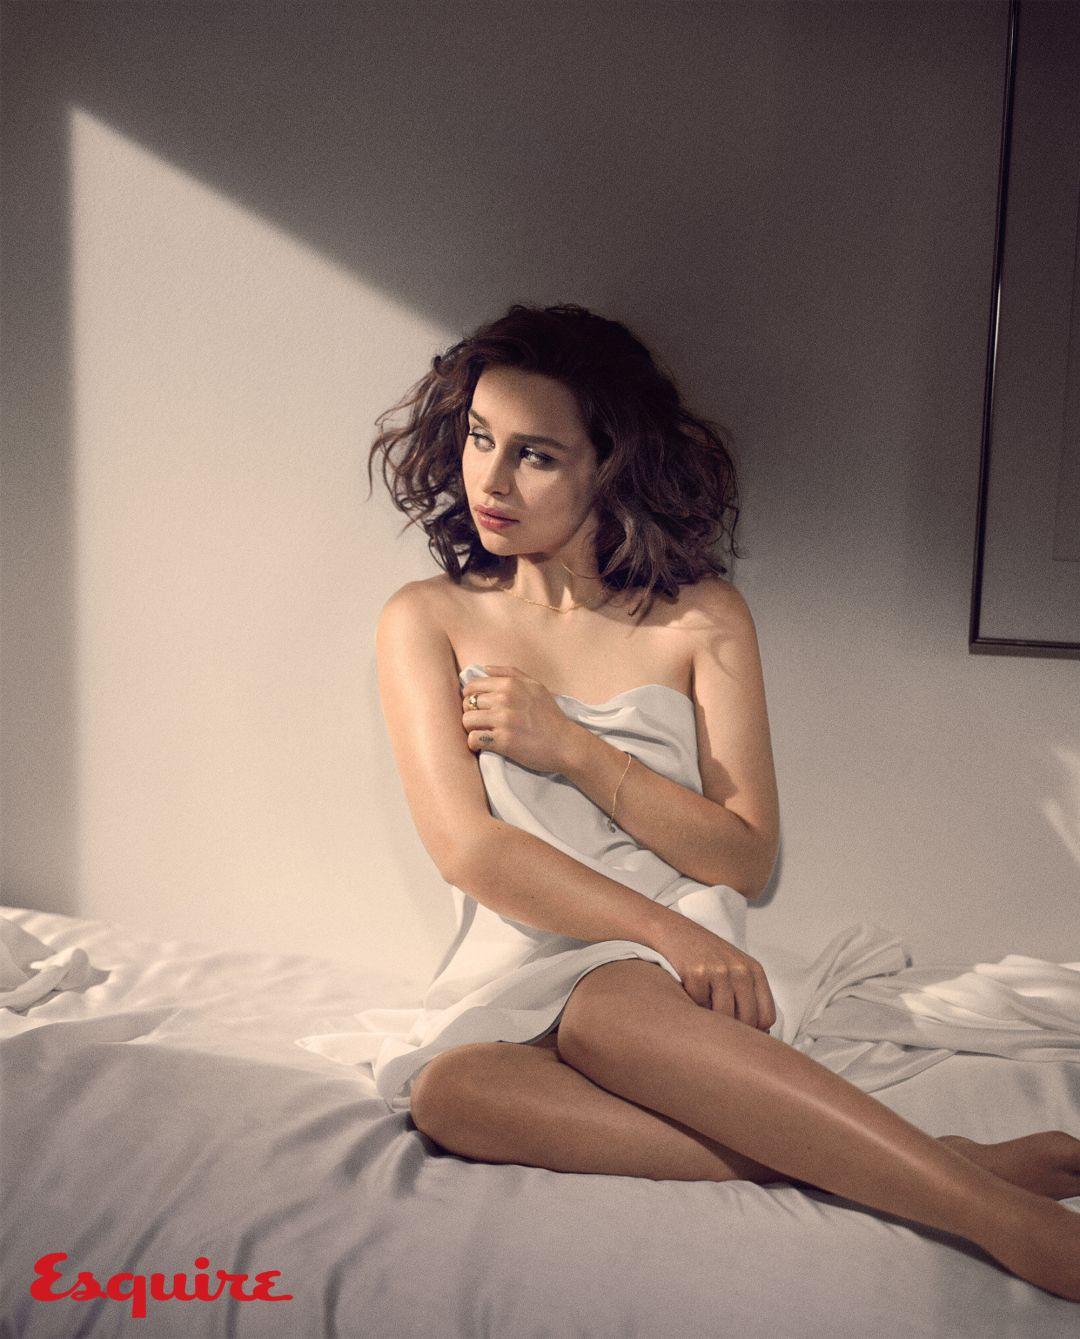 HIGH RES Esquire emilia-clarke-sexiest-woman-alive-2015 8